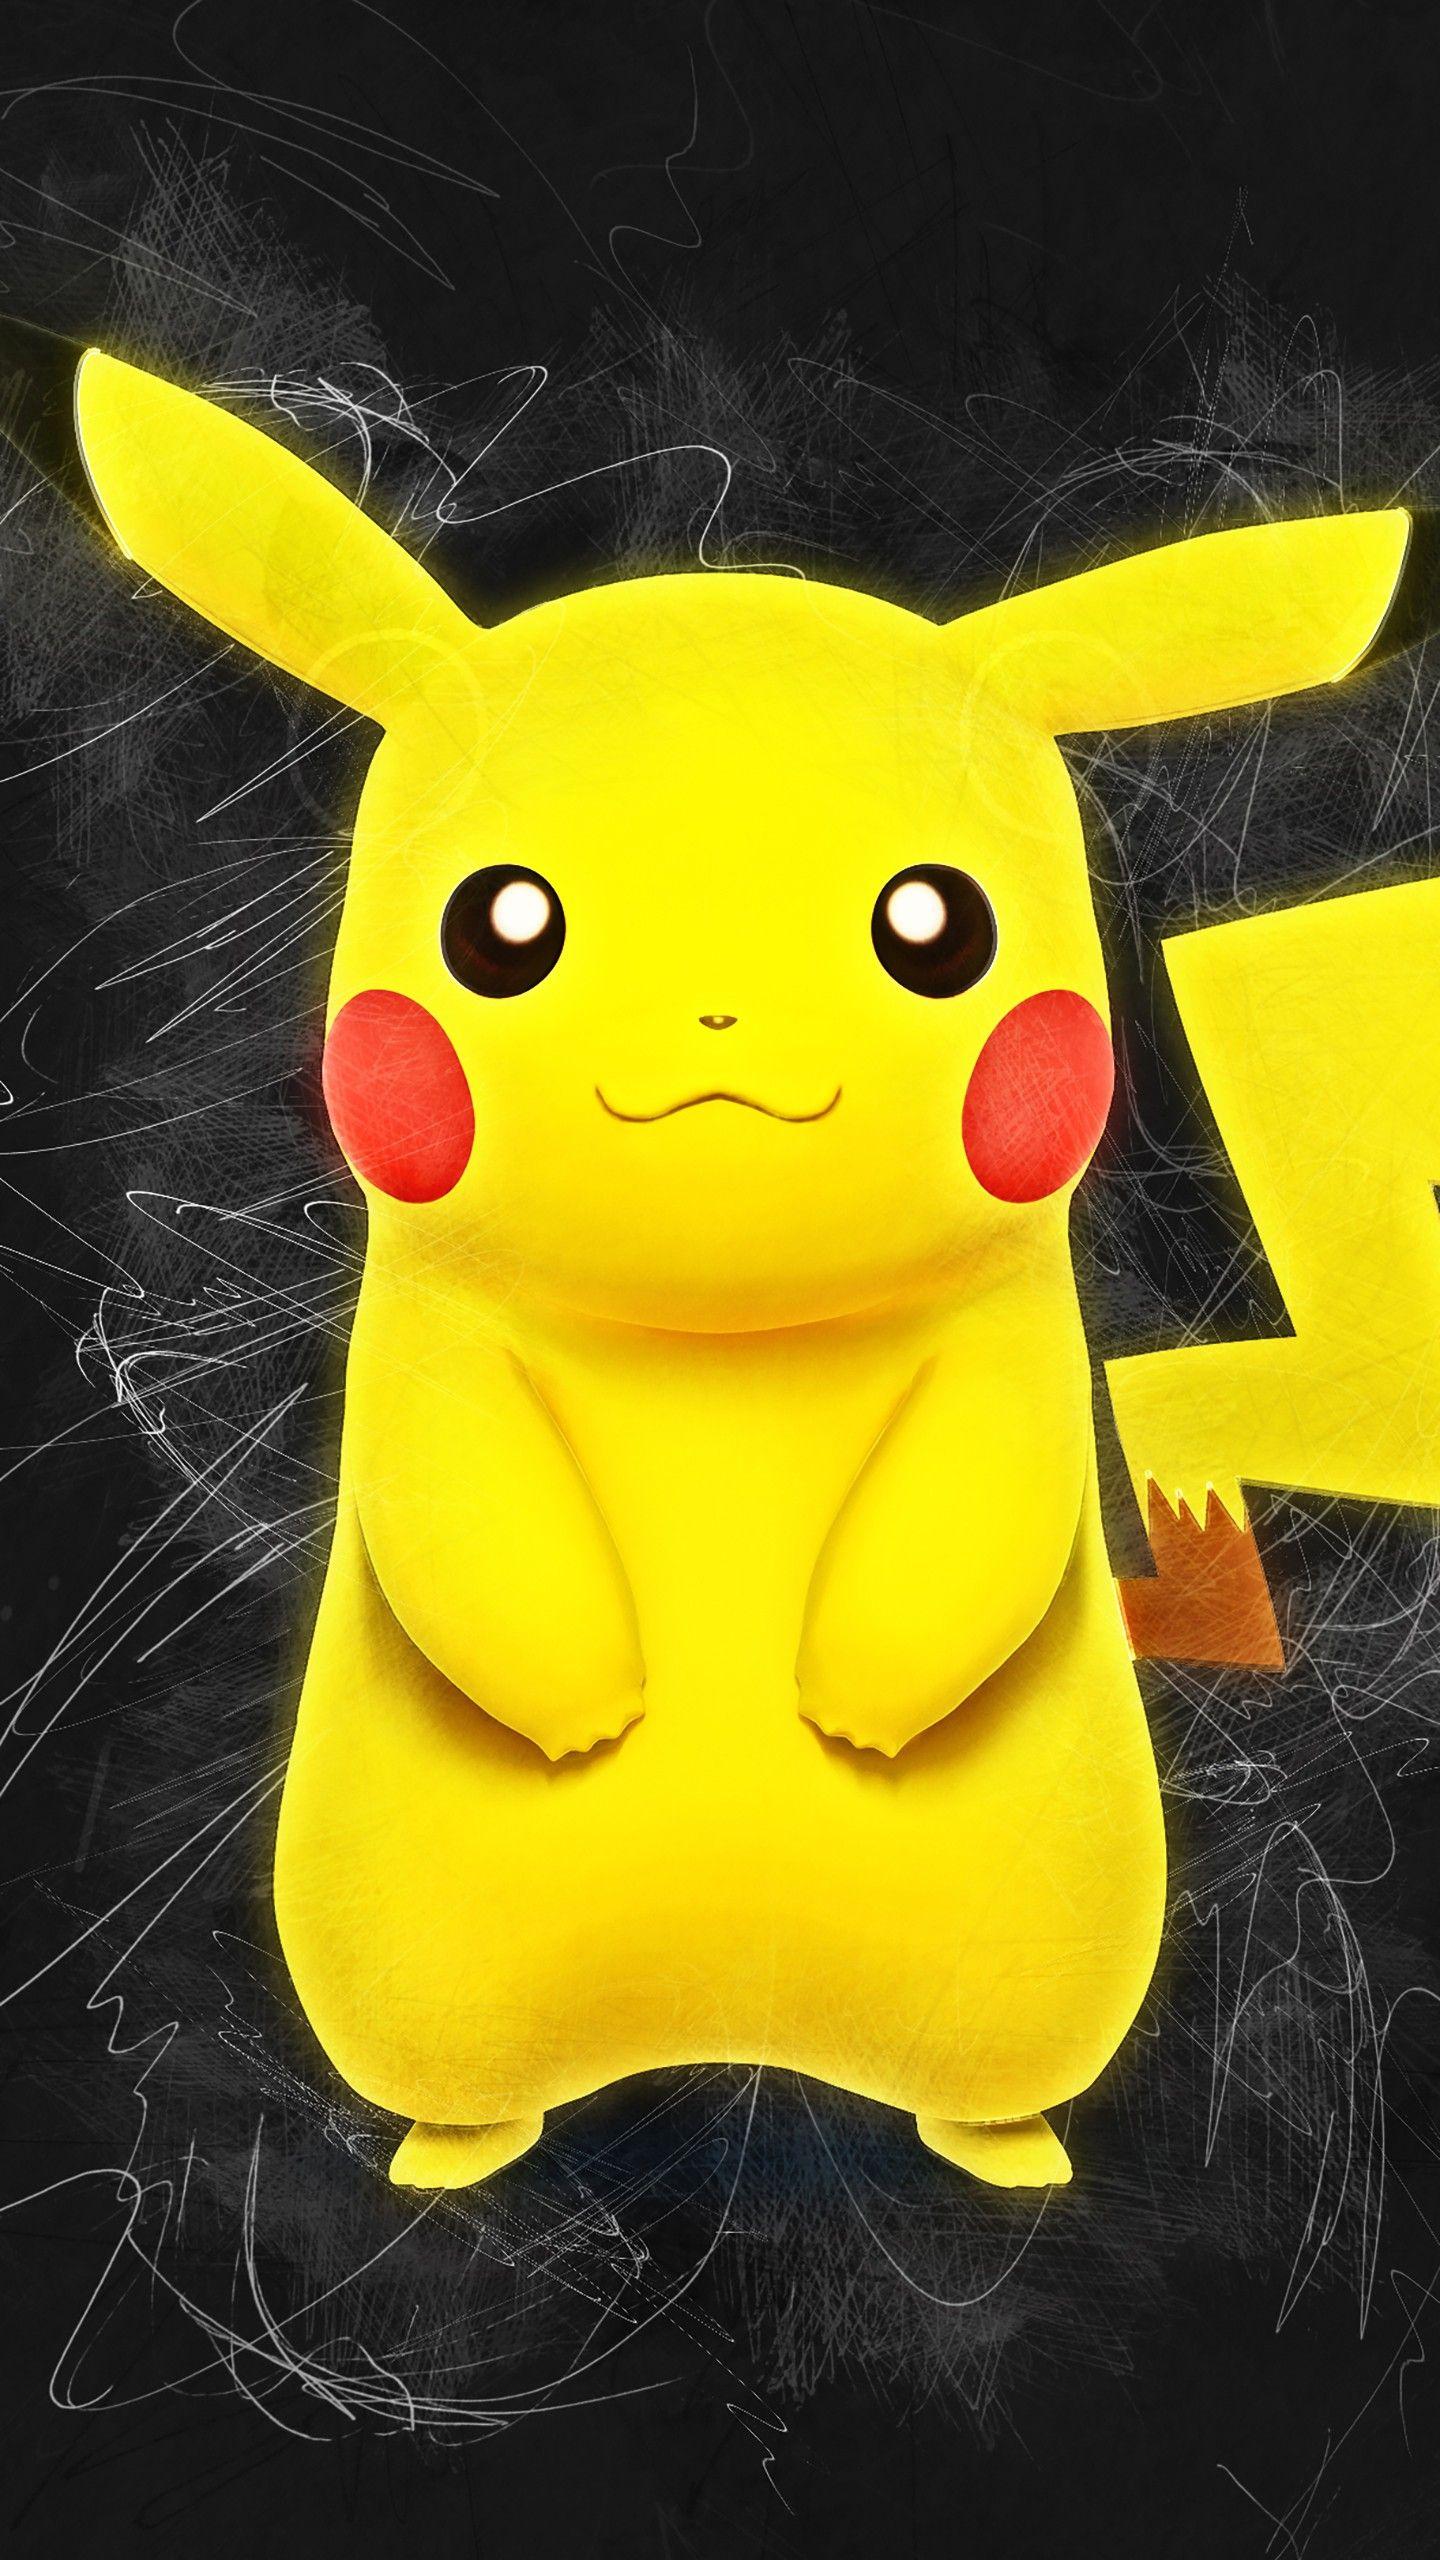 Pikachu 4k Wallpapers Wallpaper Cave